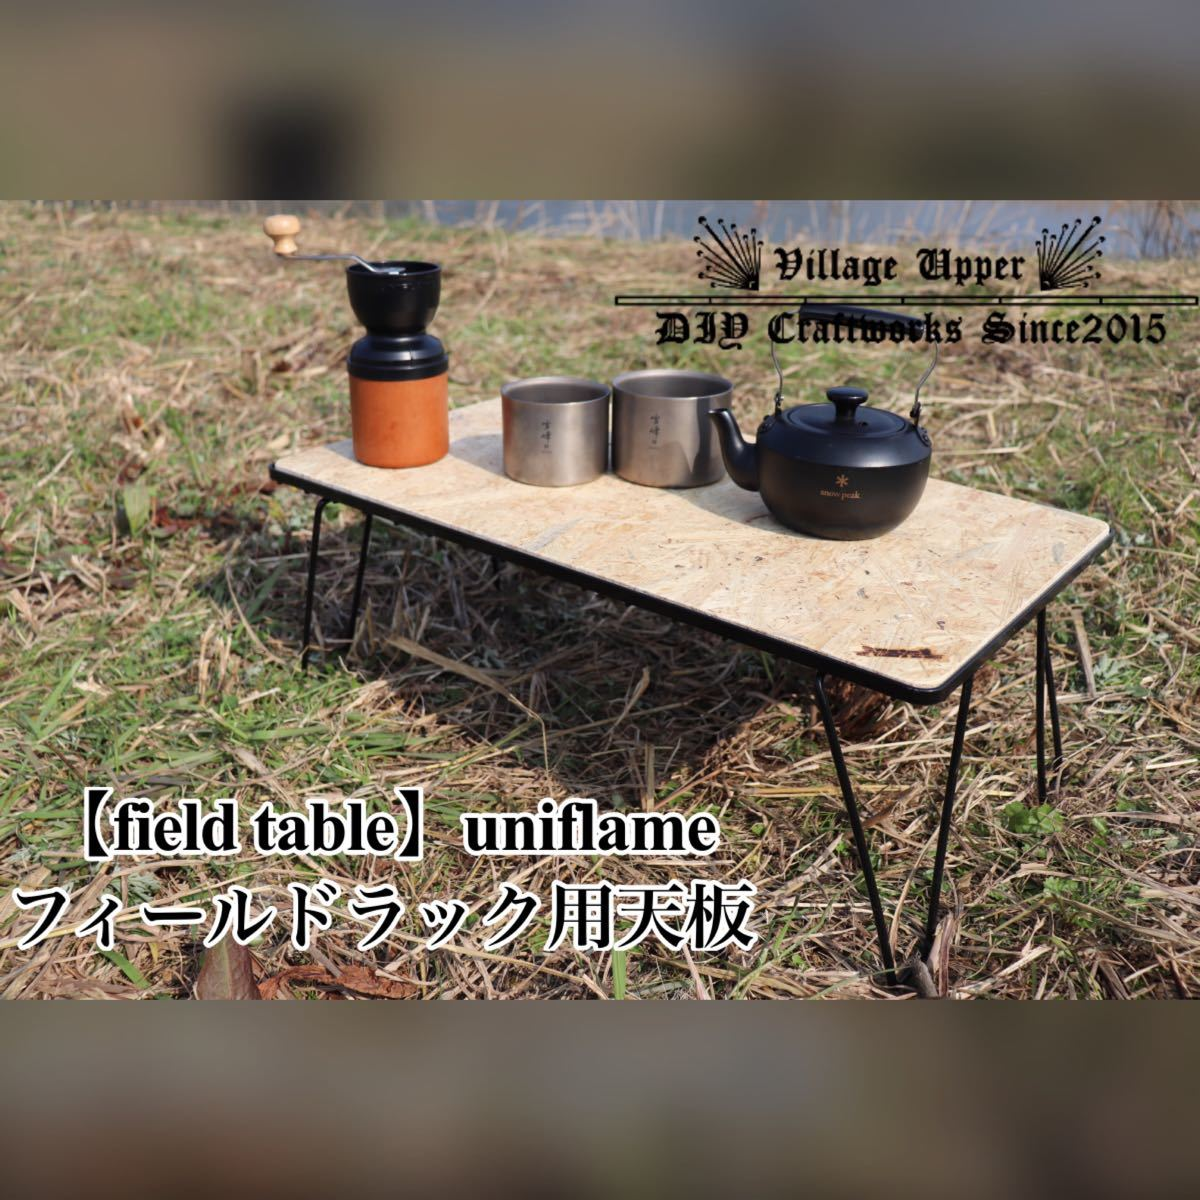 【field table】ユニフレーム  フィールドラック用天板